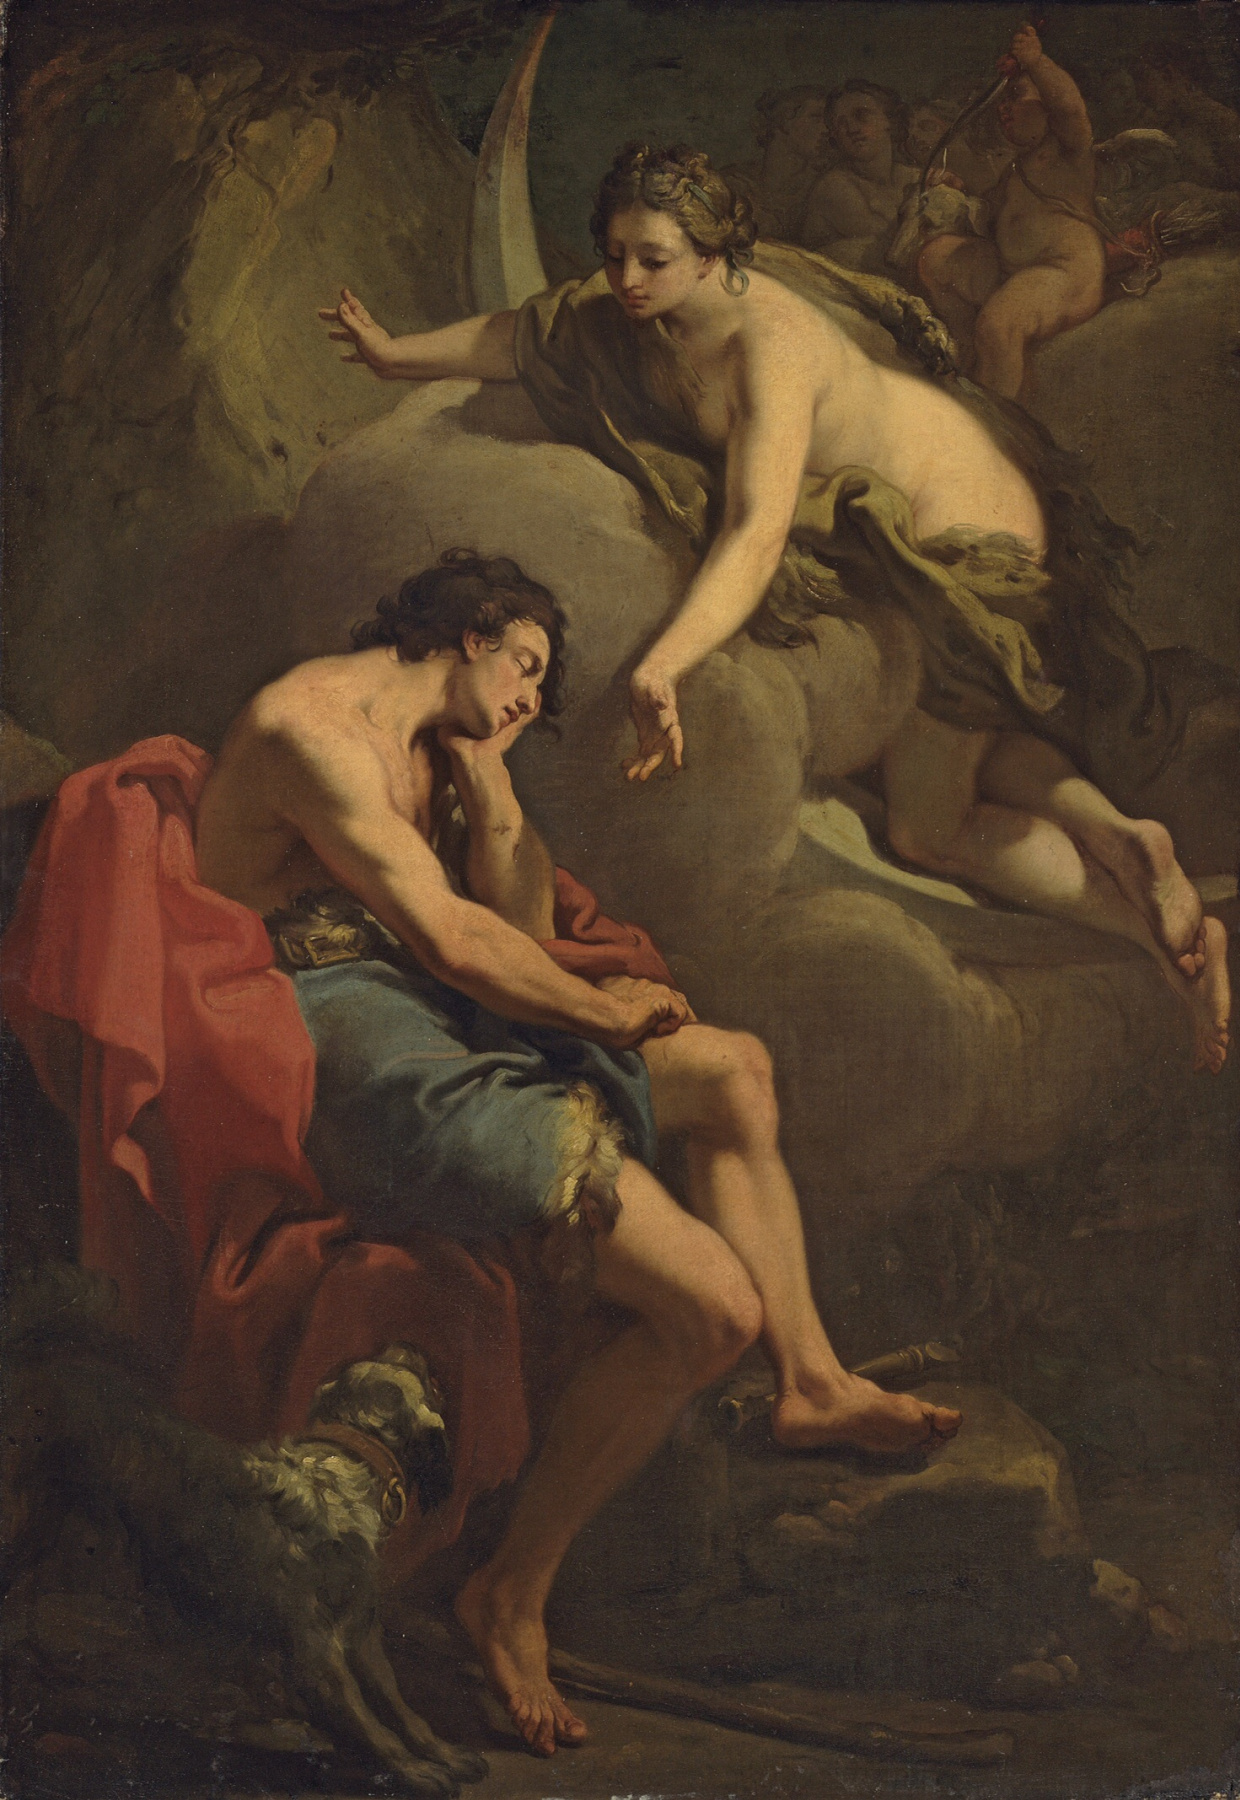 Gaetano Gandolfi. Diana and Endymion